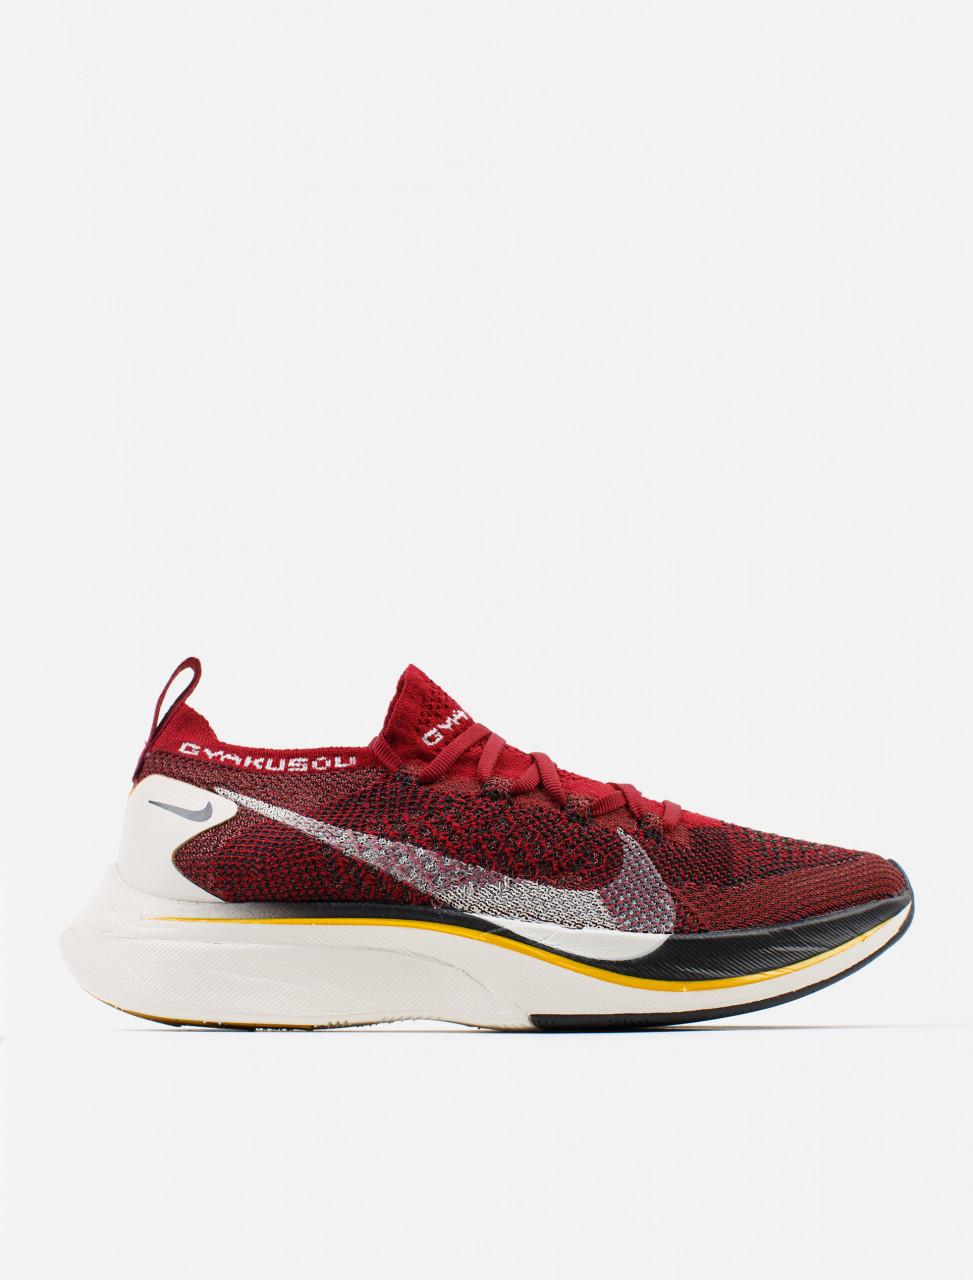 Nike x Gyakusou Vaporfly 4% Flyknit Sneaker  4396be9d8